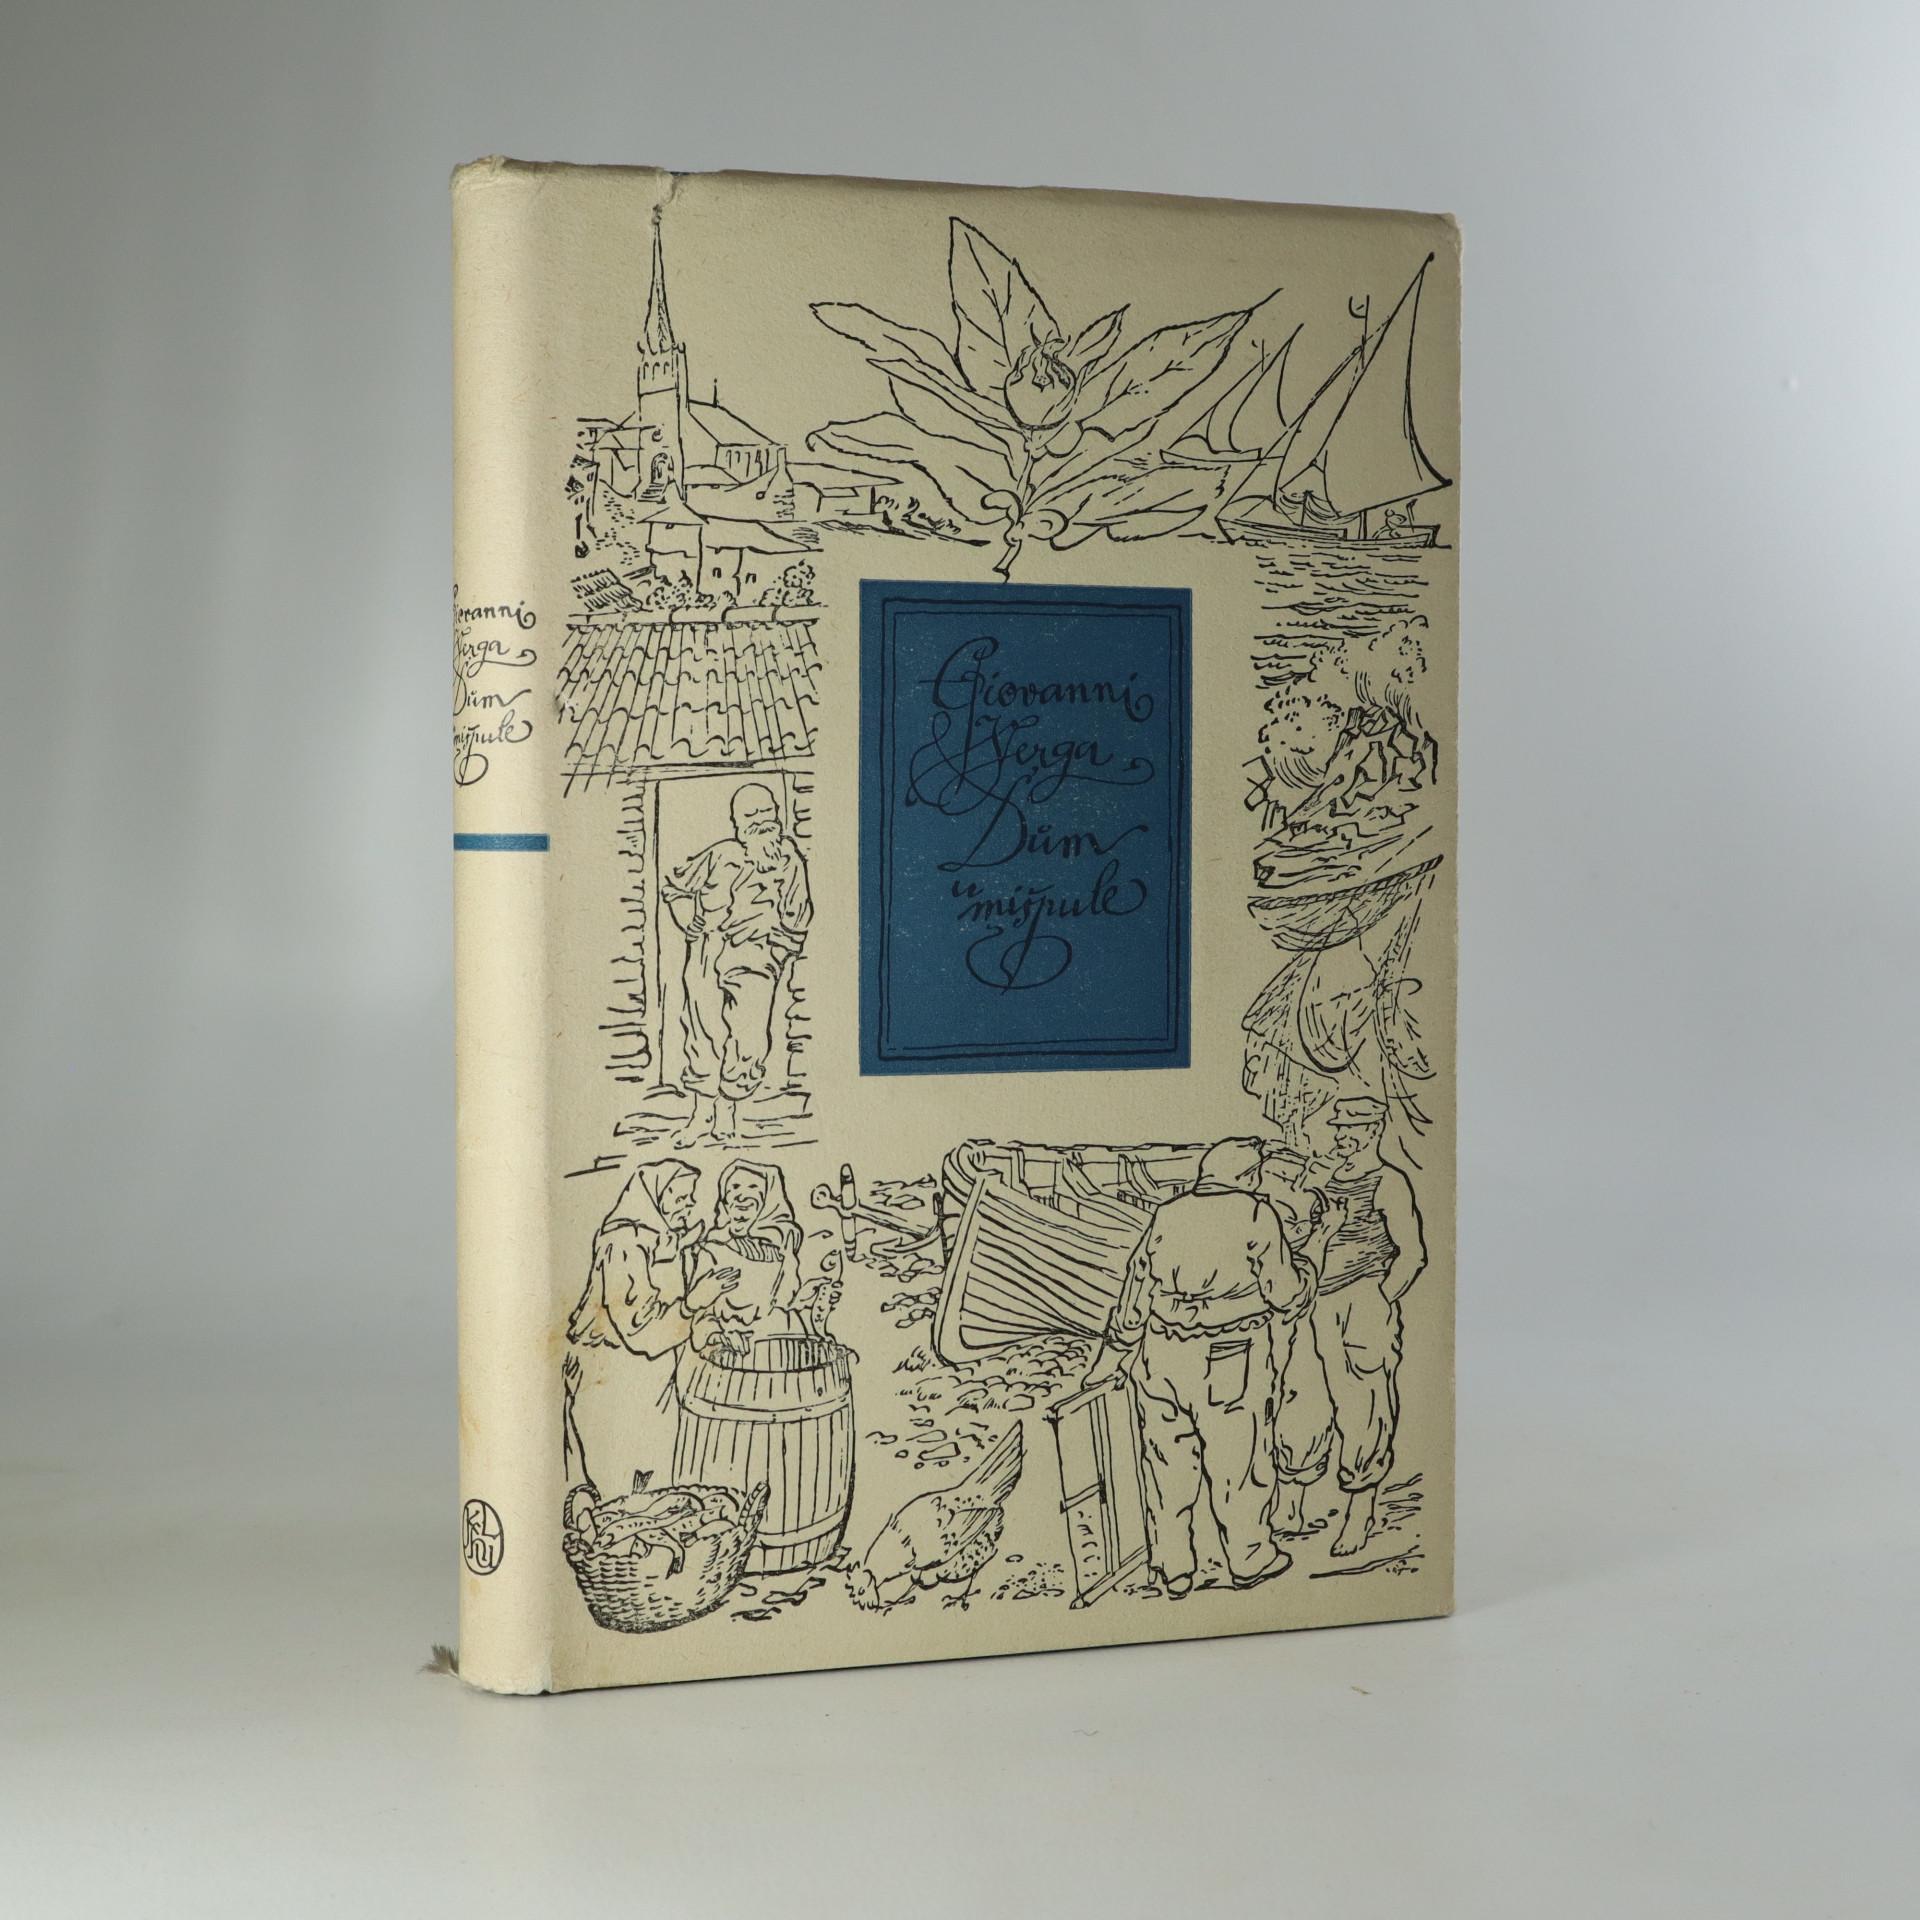 antikvární kniha Dům u mišpule, 1955